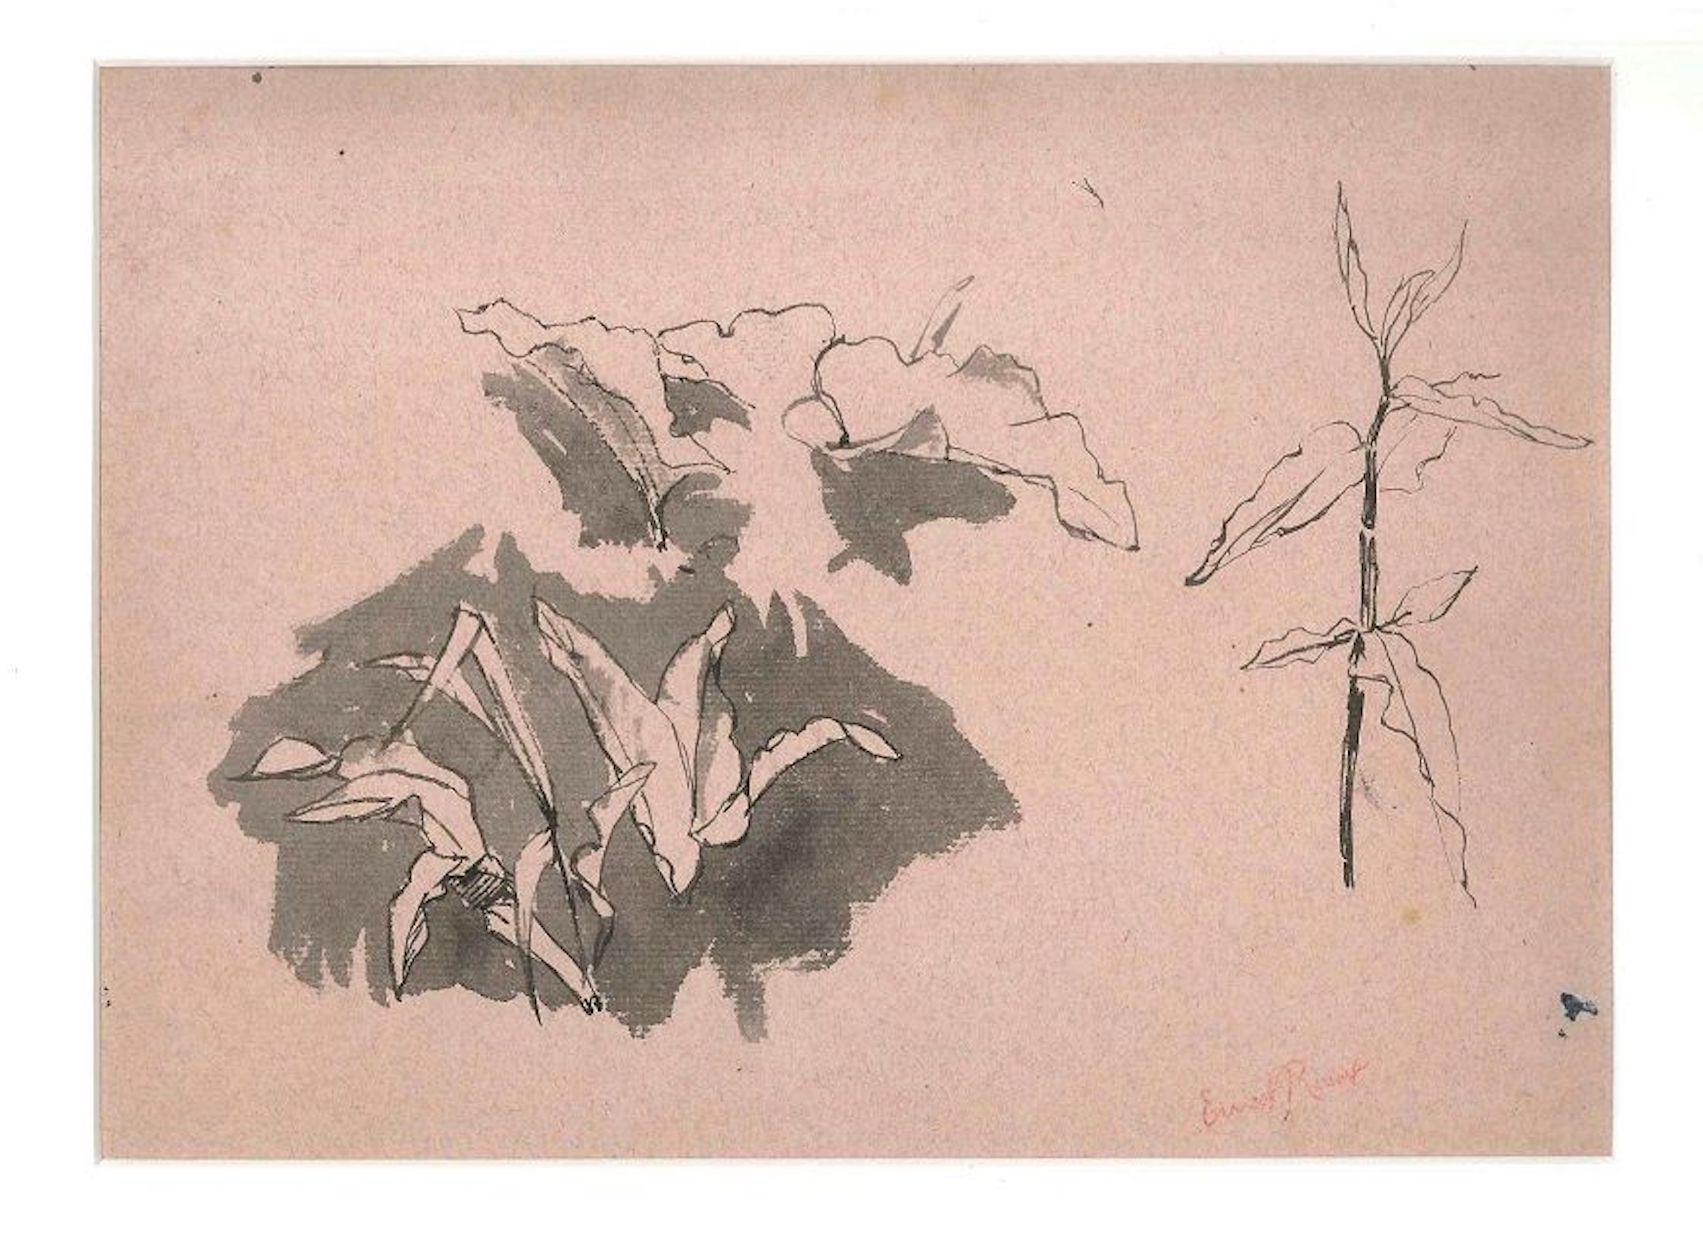 Leak Sketches - Original Pencil Drawing by Ernest Rouart - 1890s